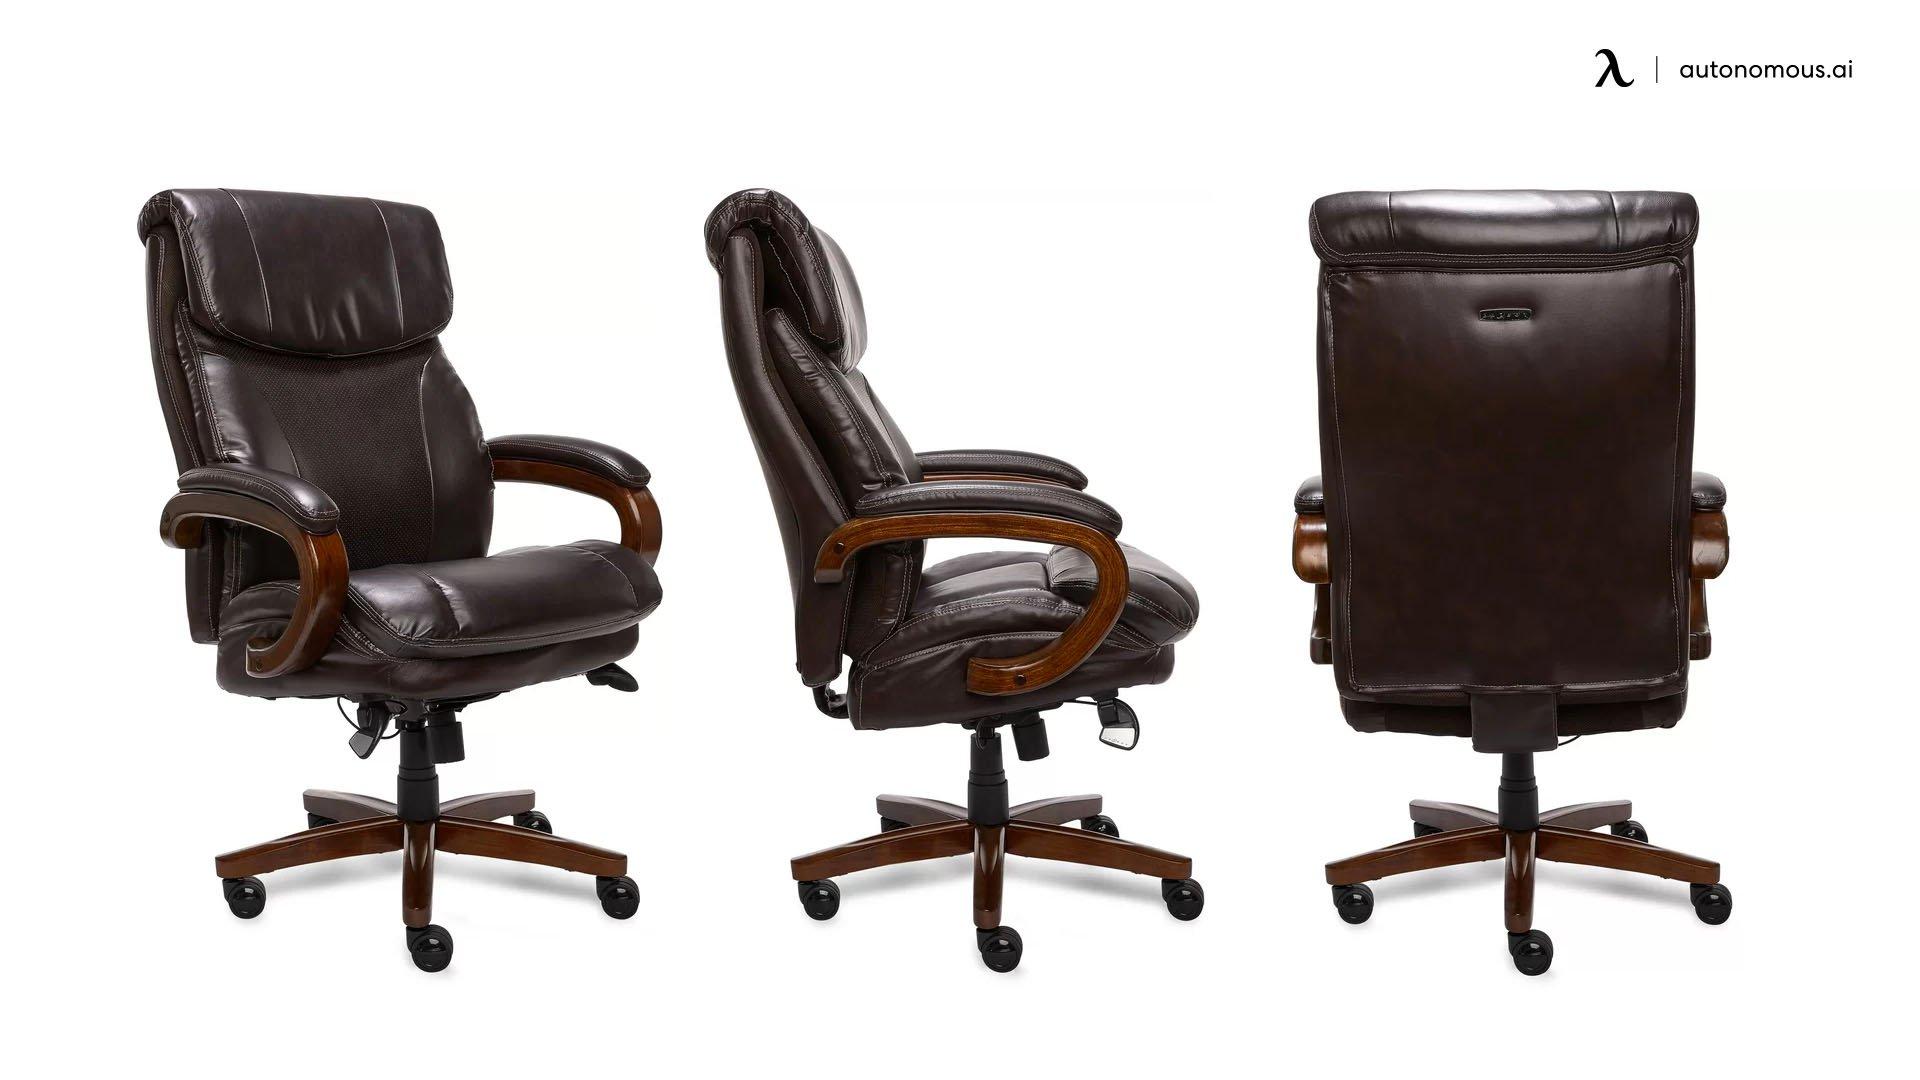 La-Z-Boy Trafford Ergonomic Chair Lower Back Pain Alleviation Device